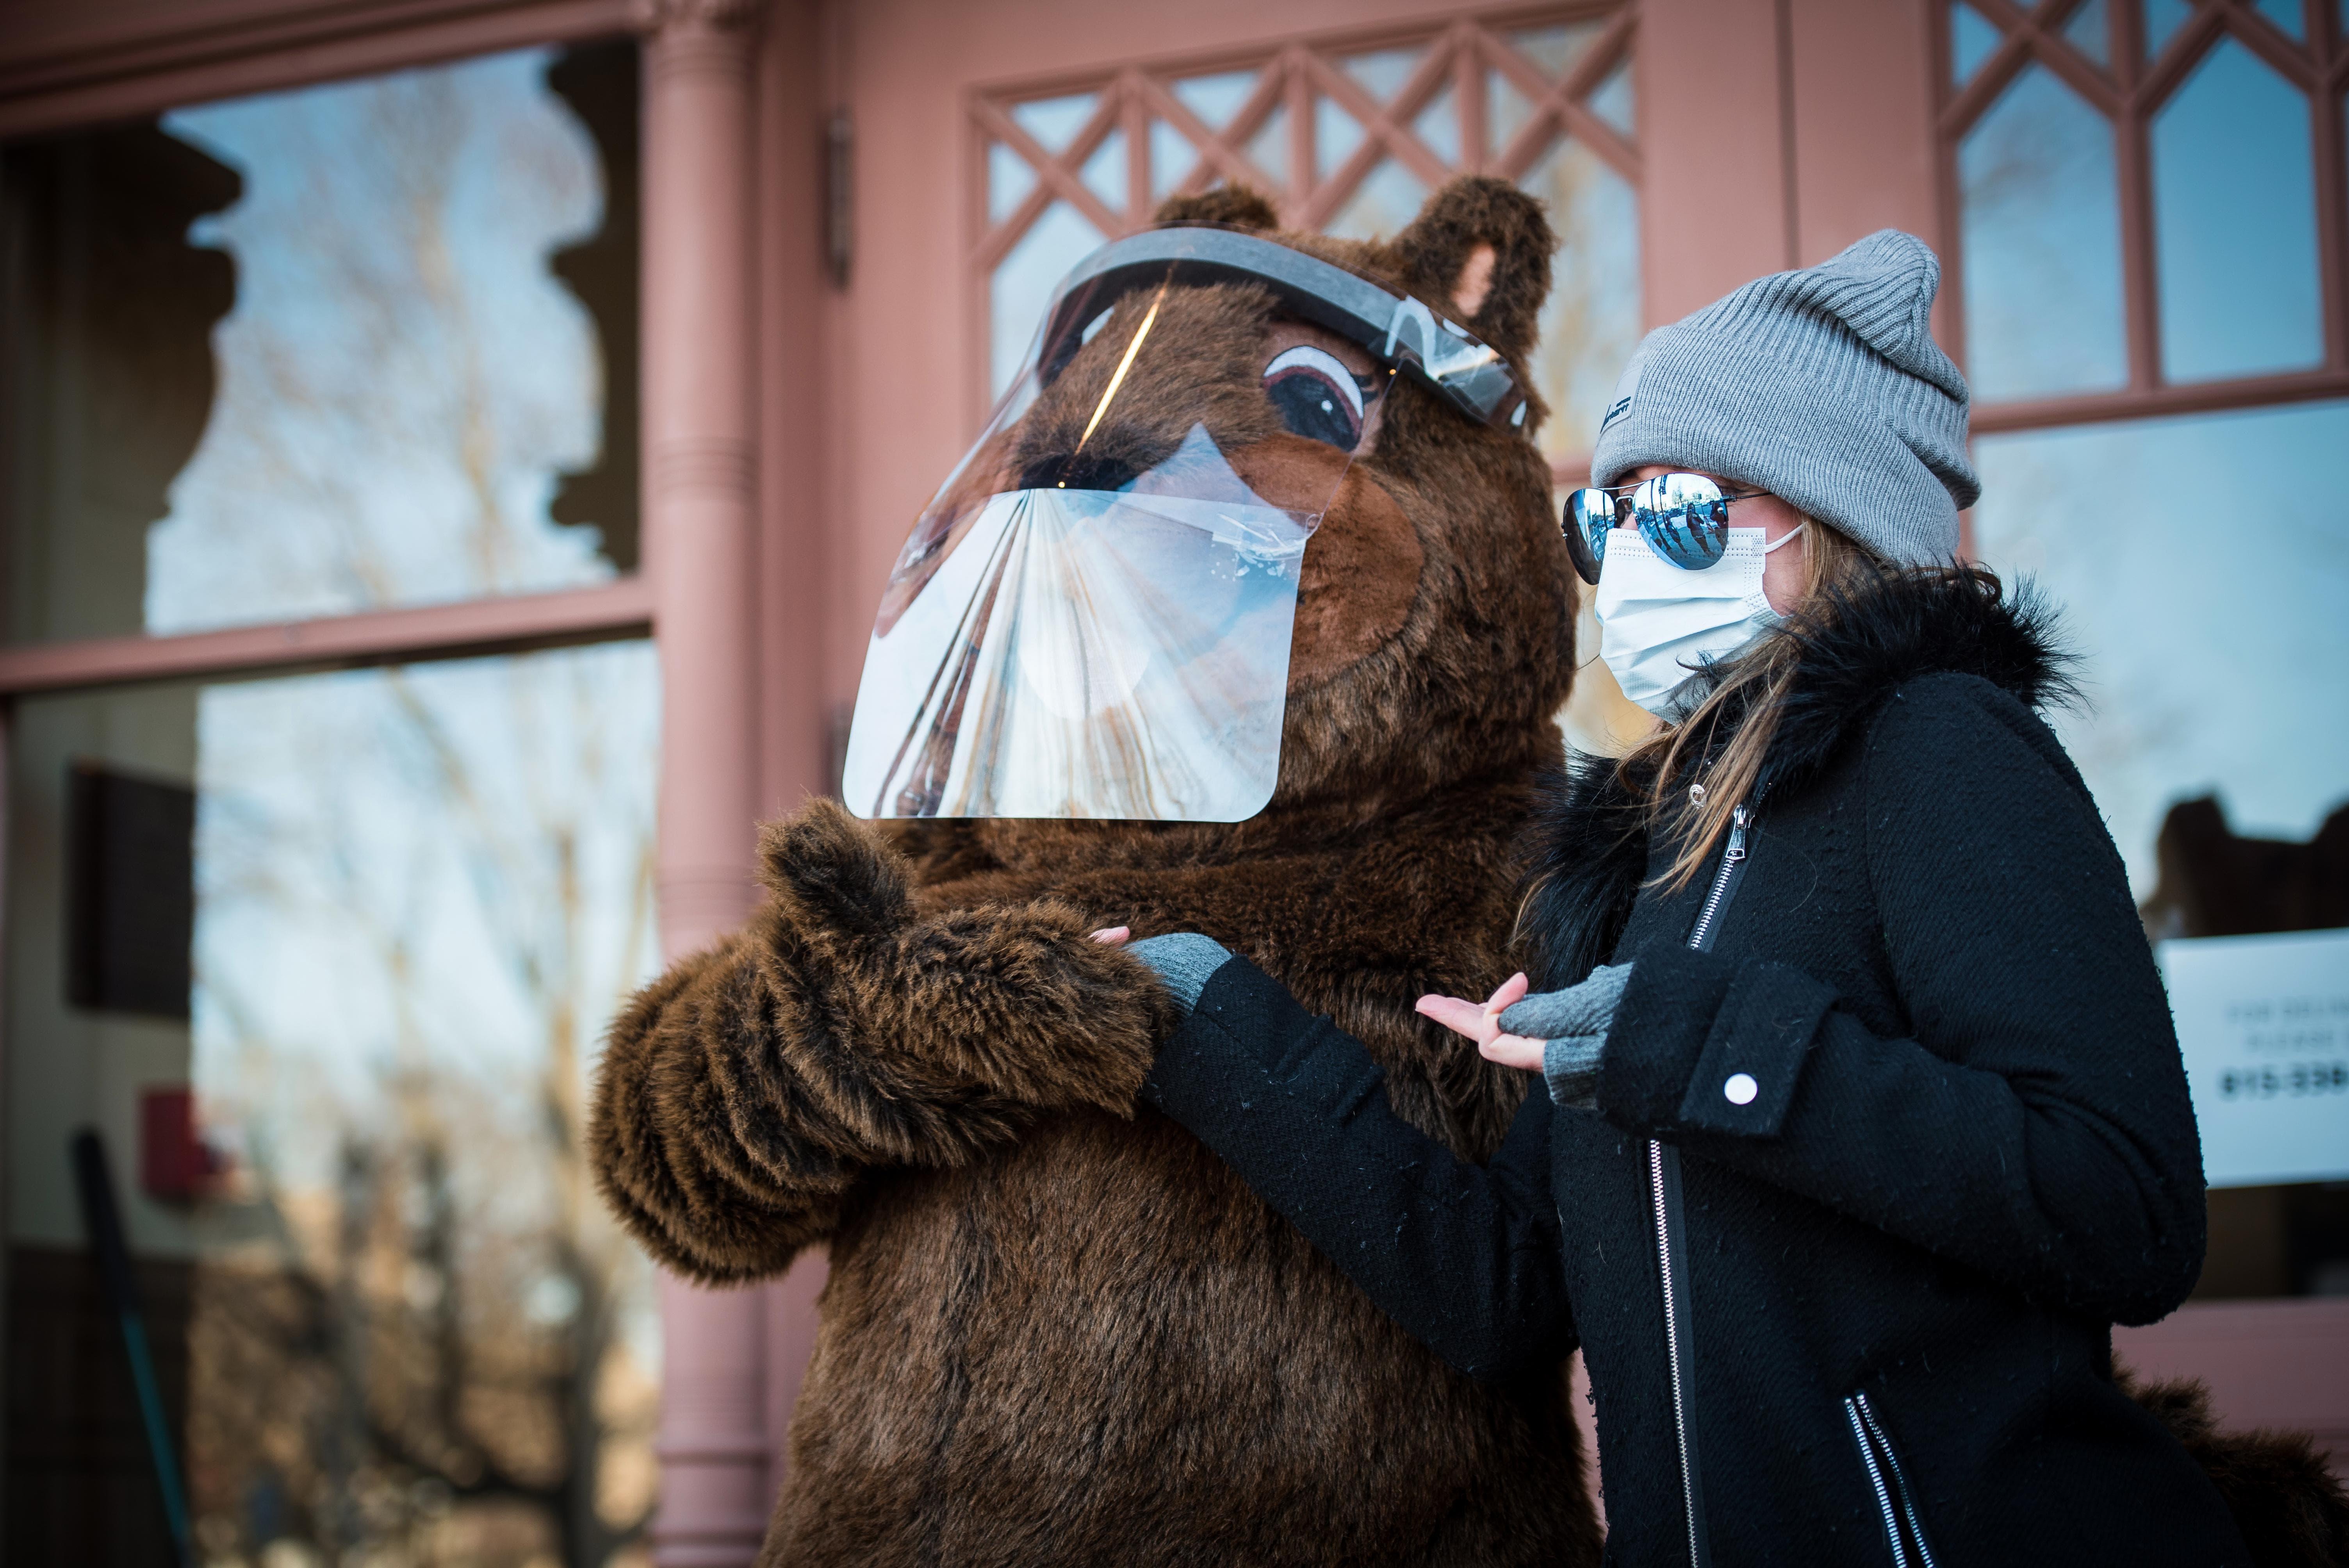 Slavin poses with Woodstock Willie in Dordan-provided face shield